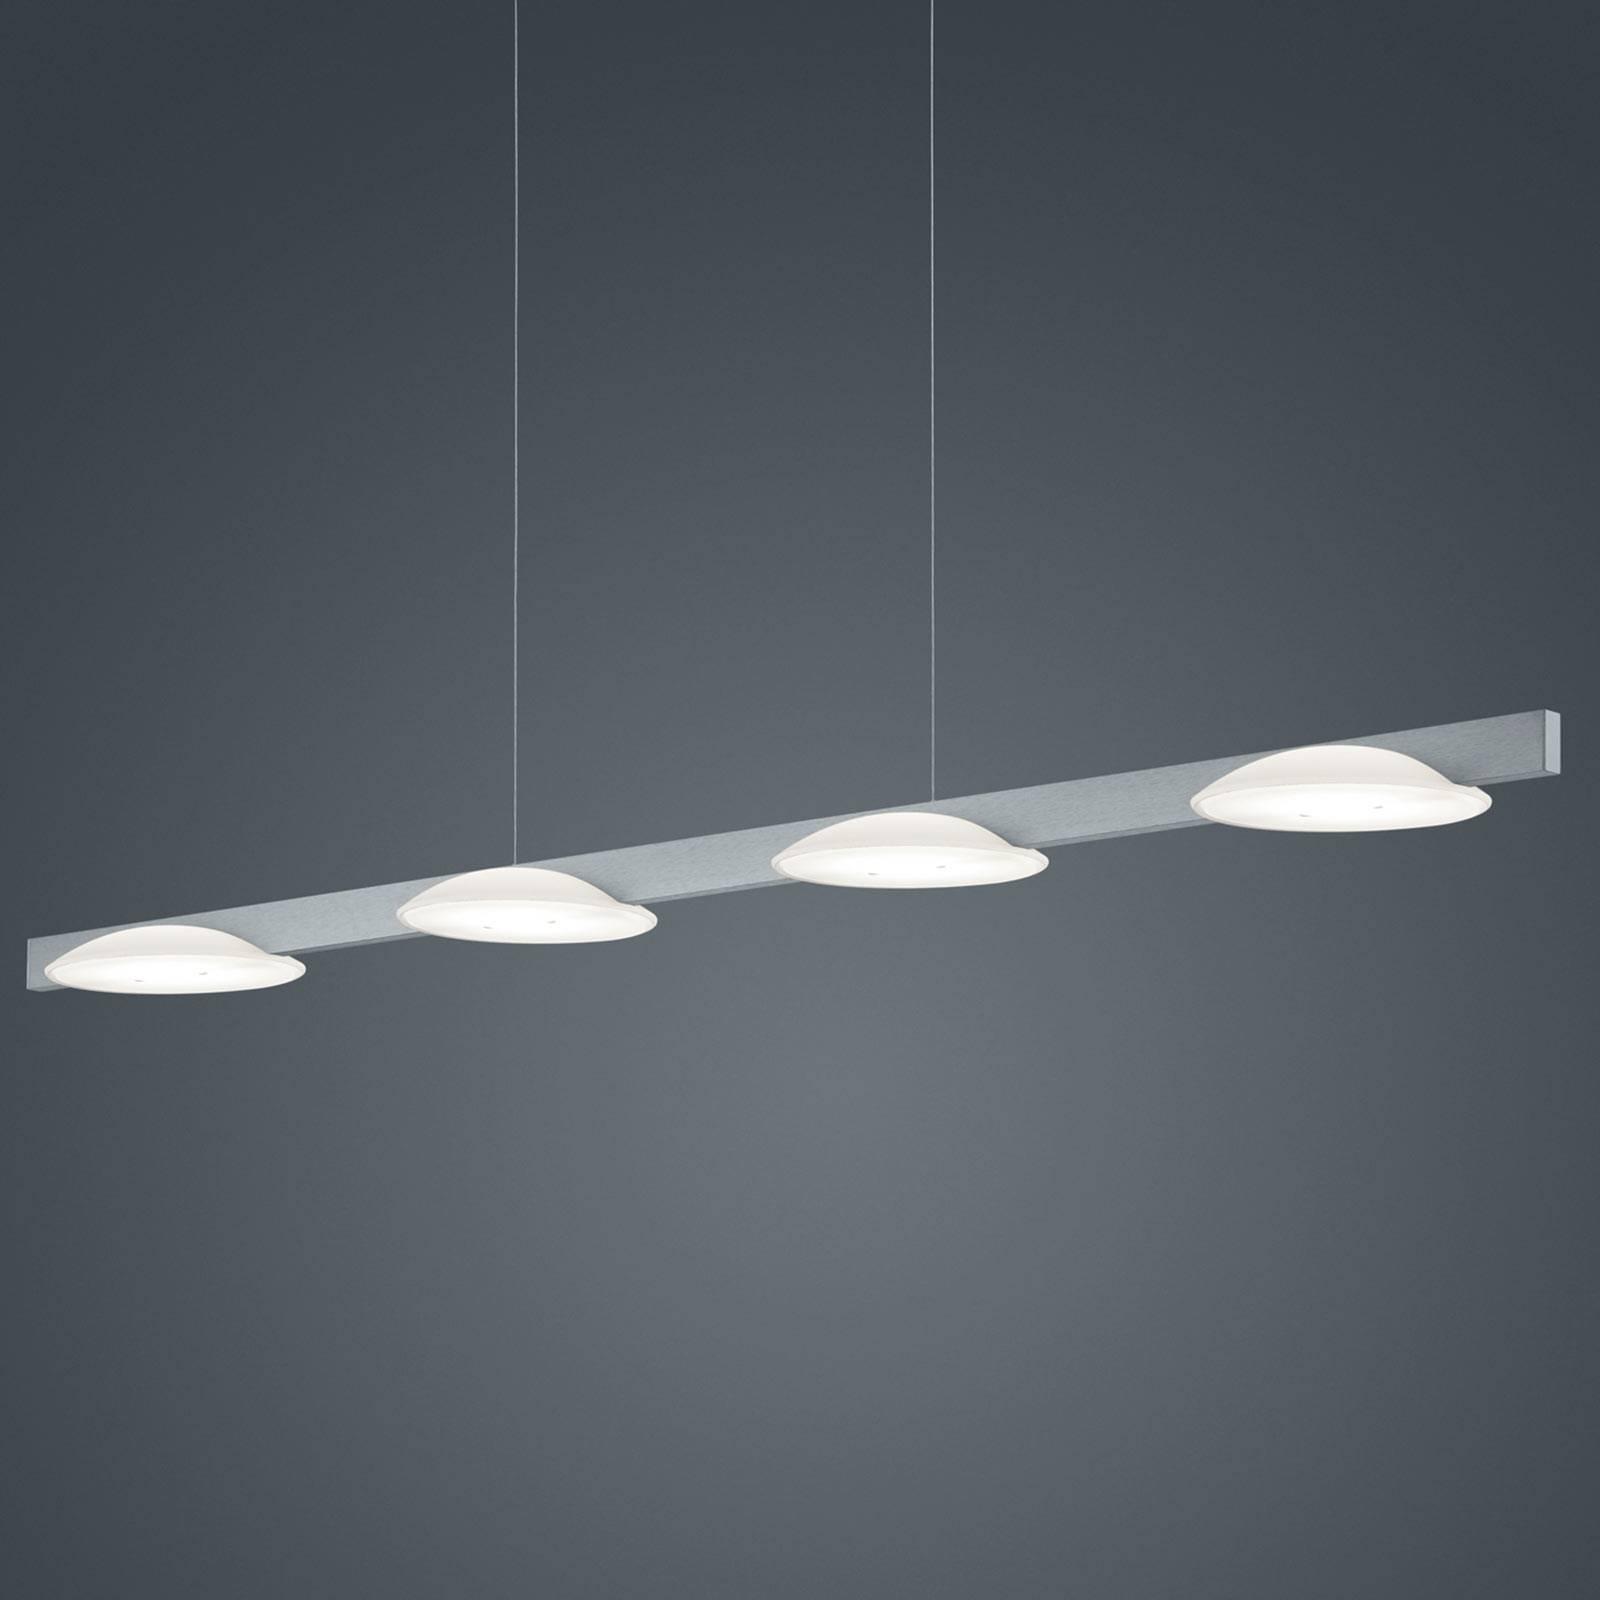 Helestra Pole lampa wisząca LED 4-punktowa nikiel